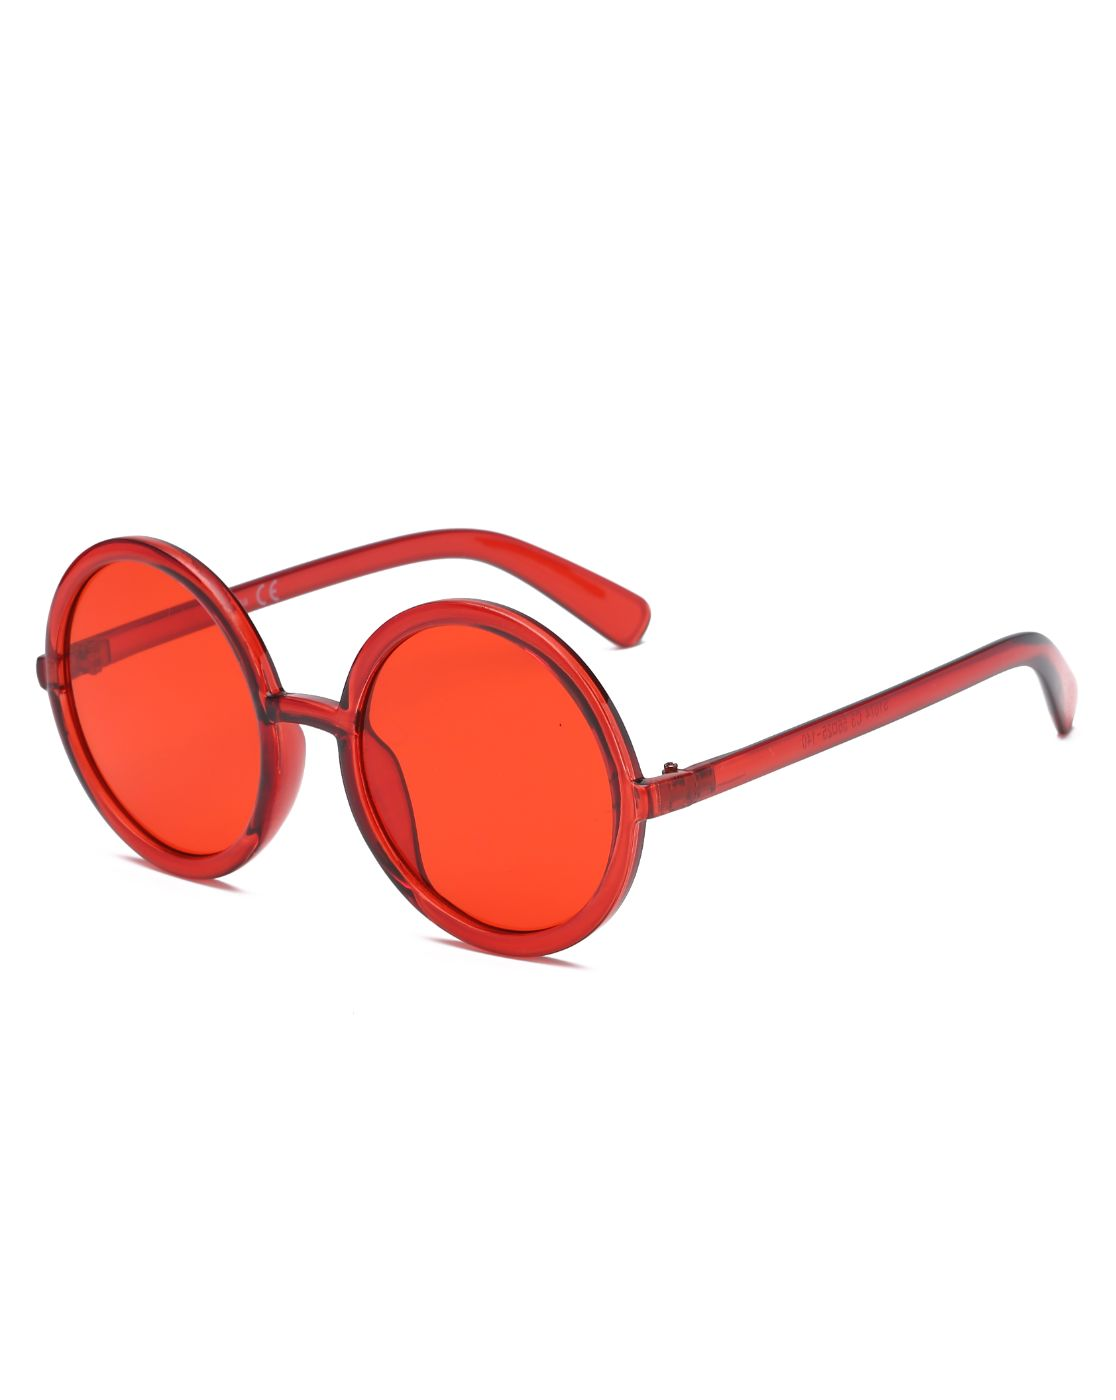 Round Oversize Fashion Sunglasses - orangeshine.com